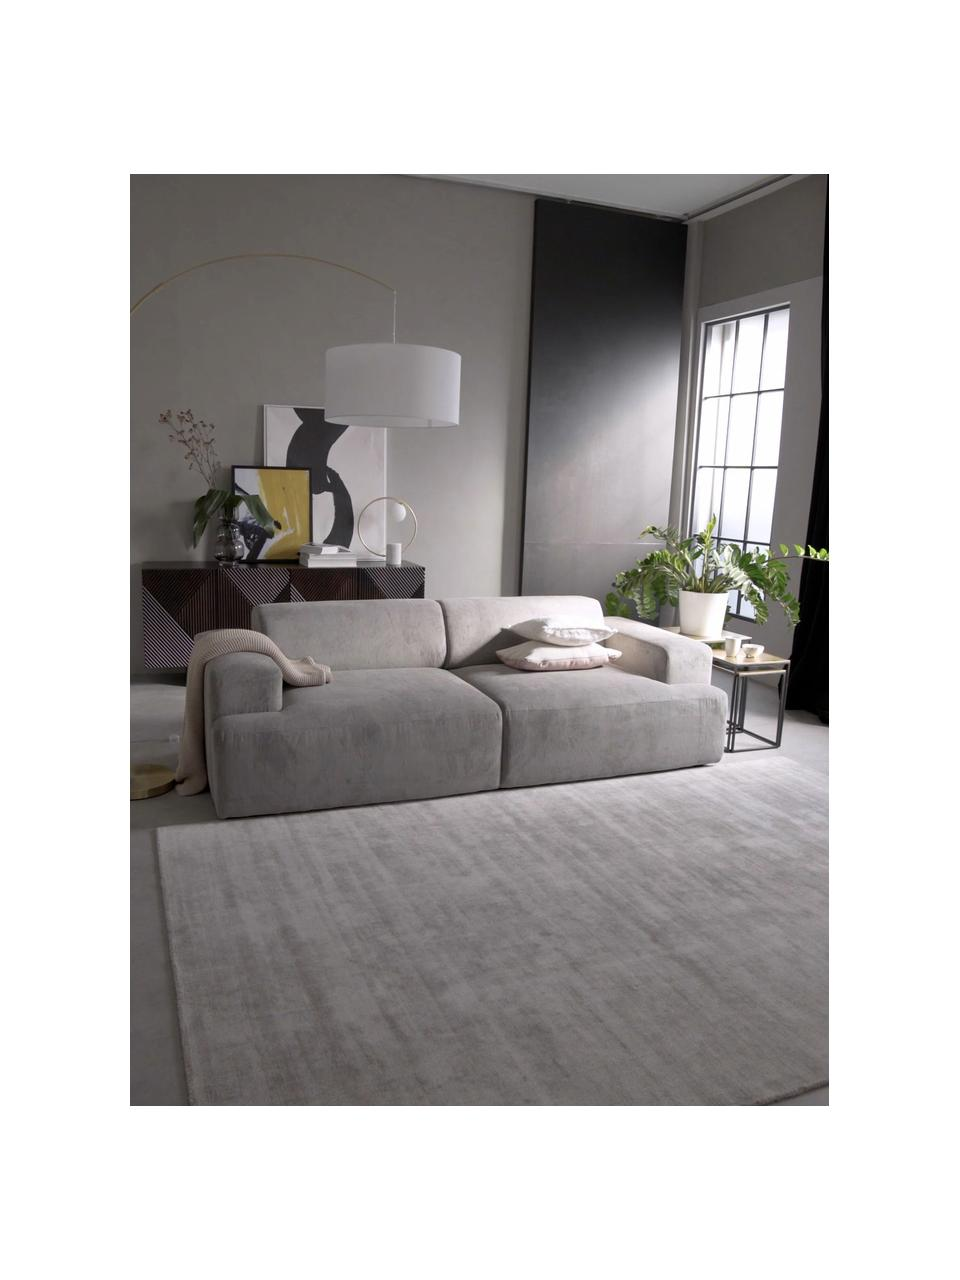 Ribfluwelen bank Melva (3-zits) in grijs, Bekleding: corduroy (92% polyester, , Frame: massief grenenhout, FSC-g, Poten: kunststof, Corduroy grijs, 238 x 101 cm